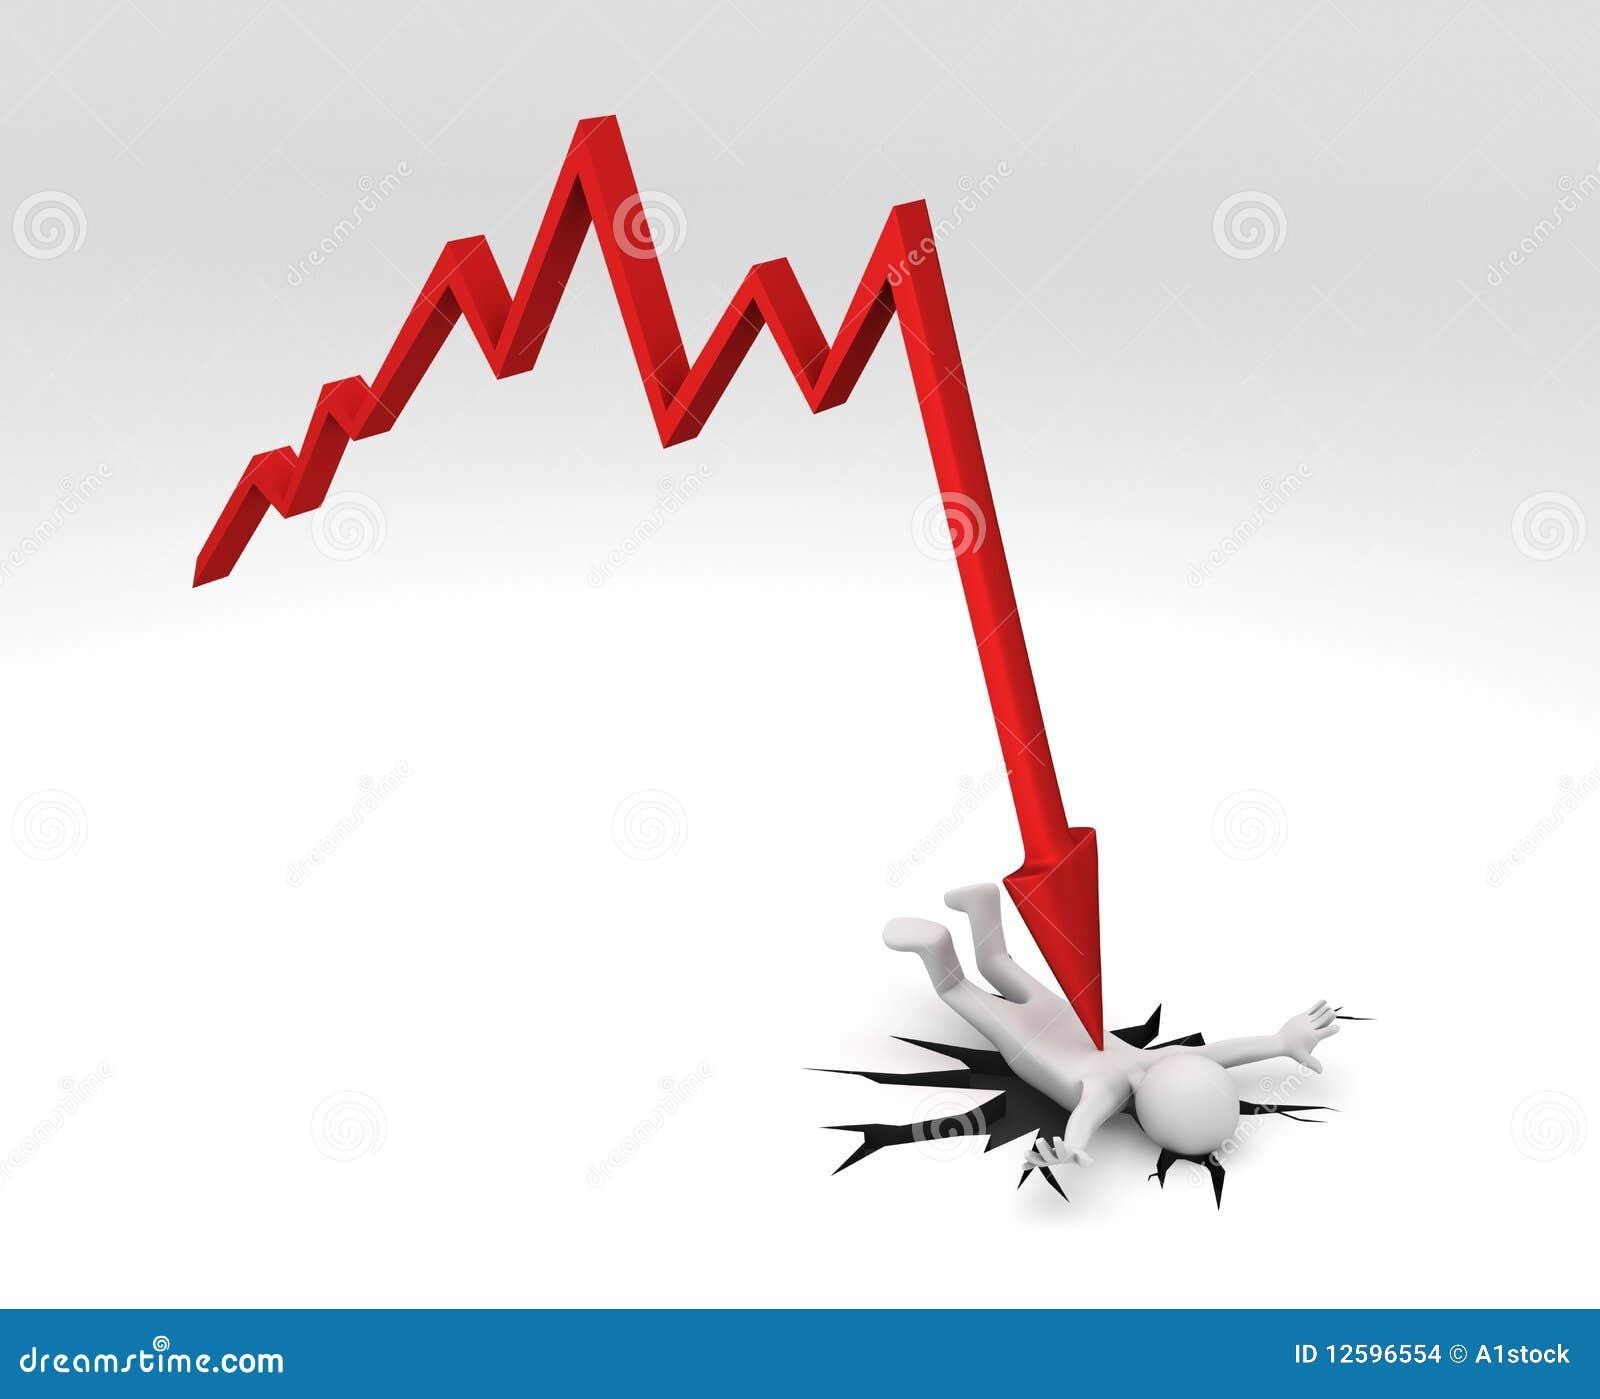 Chart Crashing Down On Person Stock Illustration ...